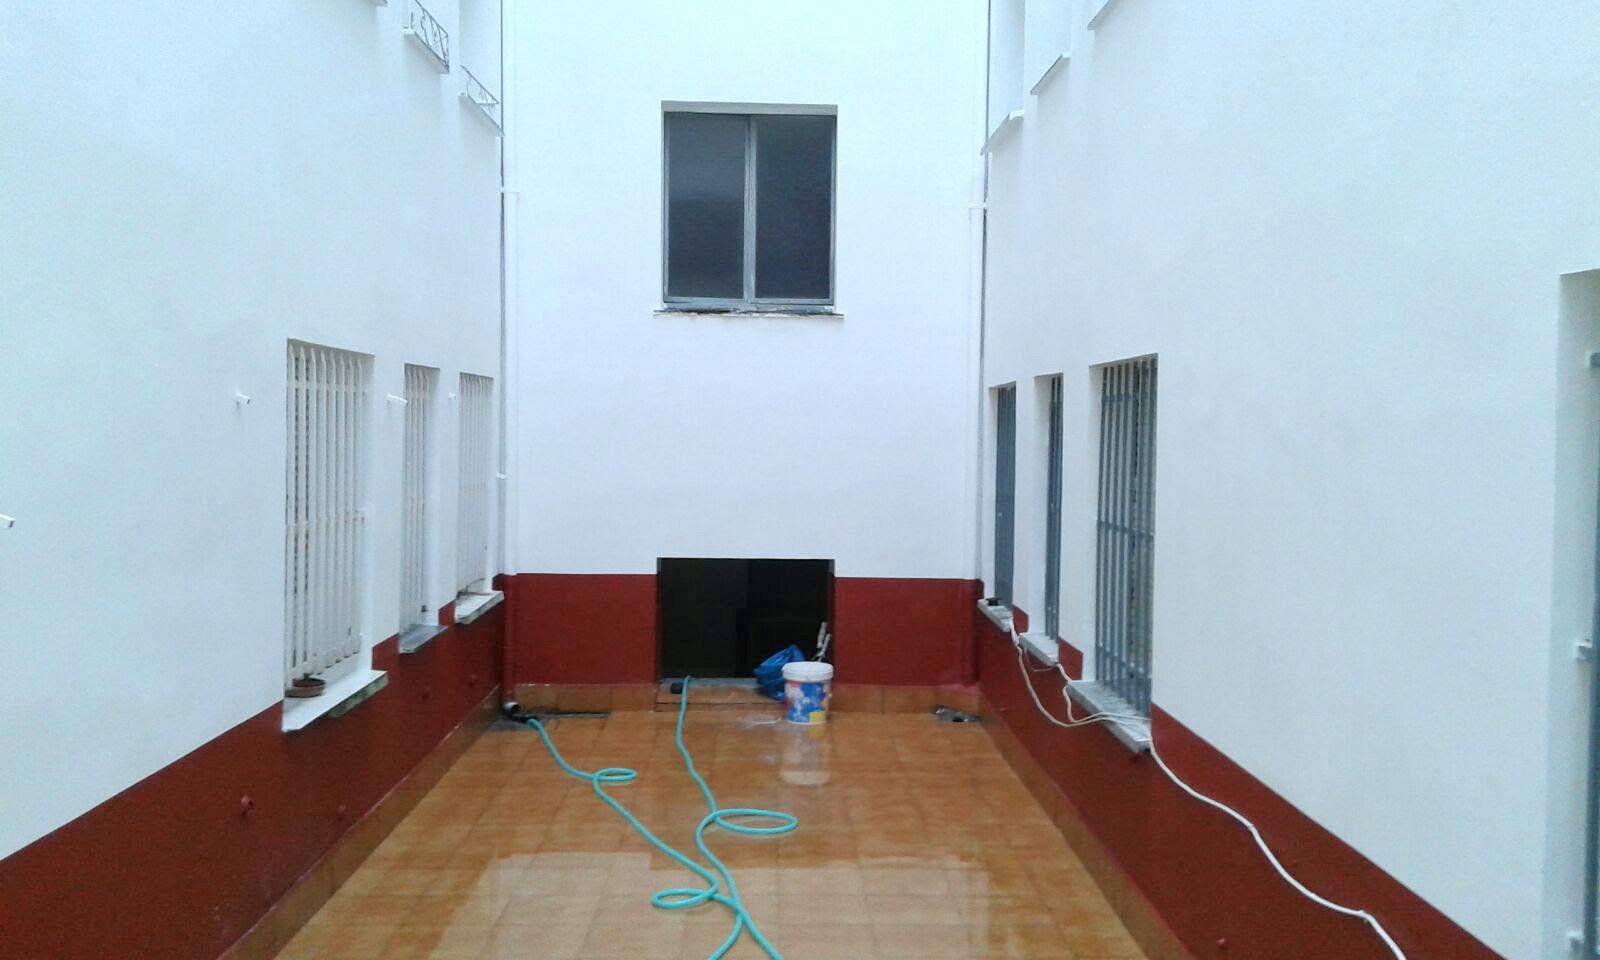 Patio de luces enlucido de fachada interior sos cubiertas for Patio de luces normativa